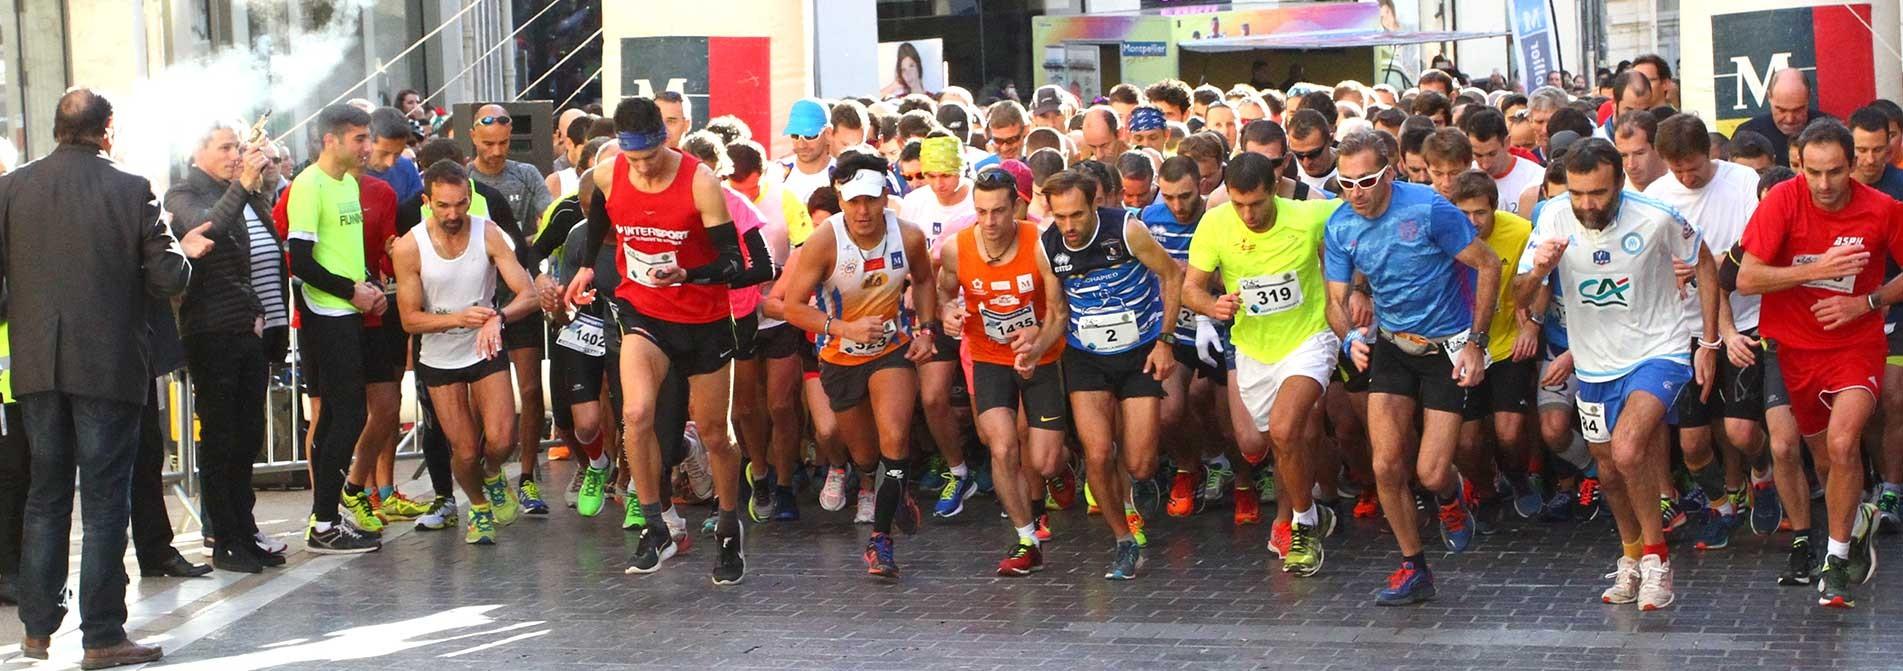 20KM de Montpellier 2016